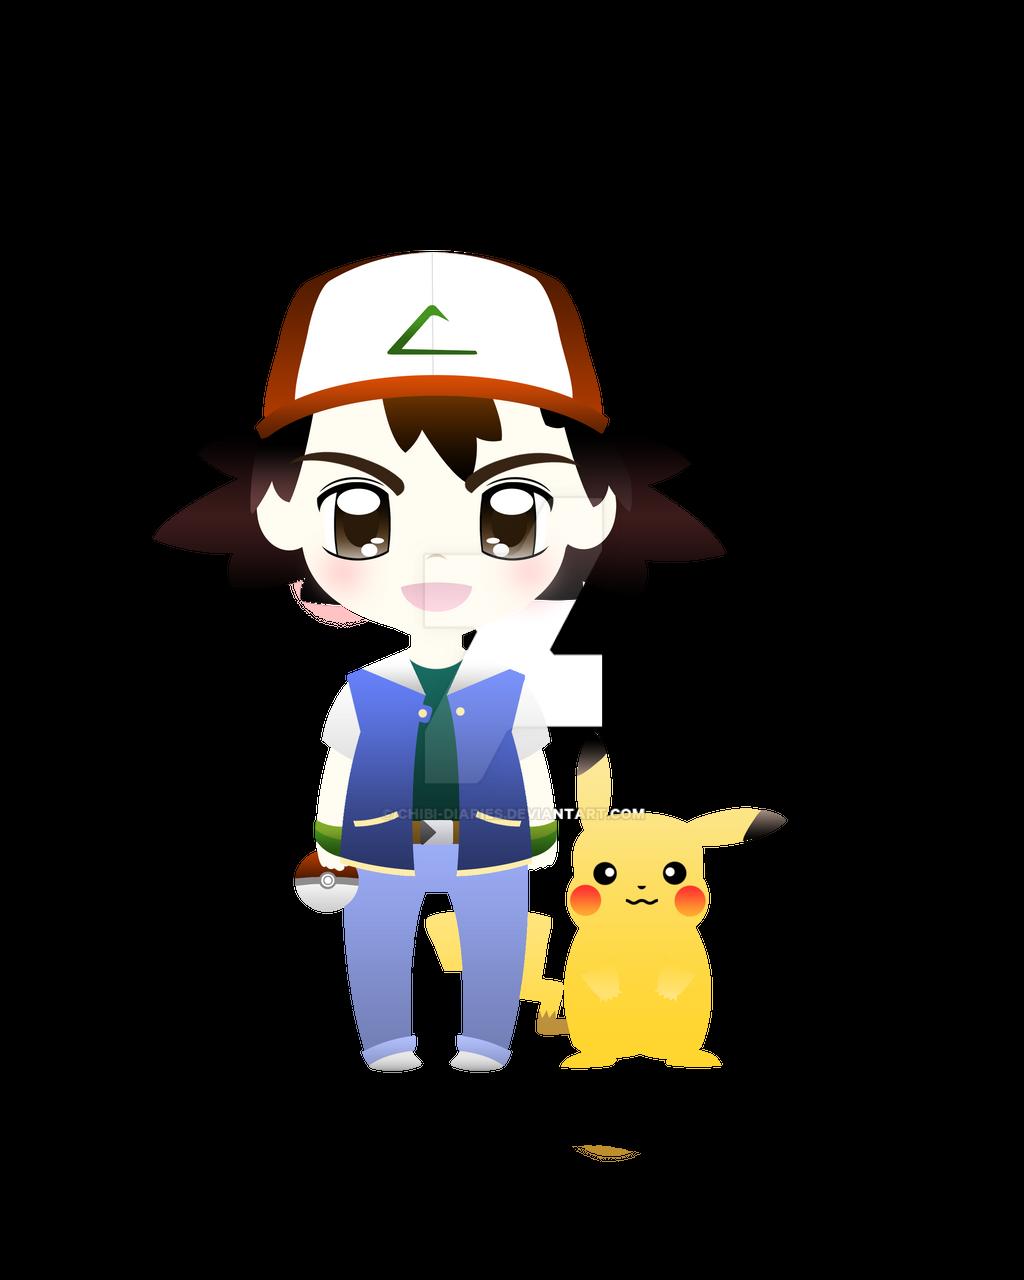 Chibi pikachu with ashs hat